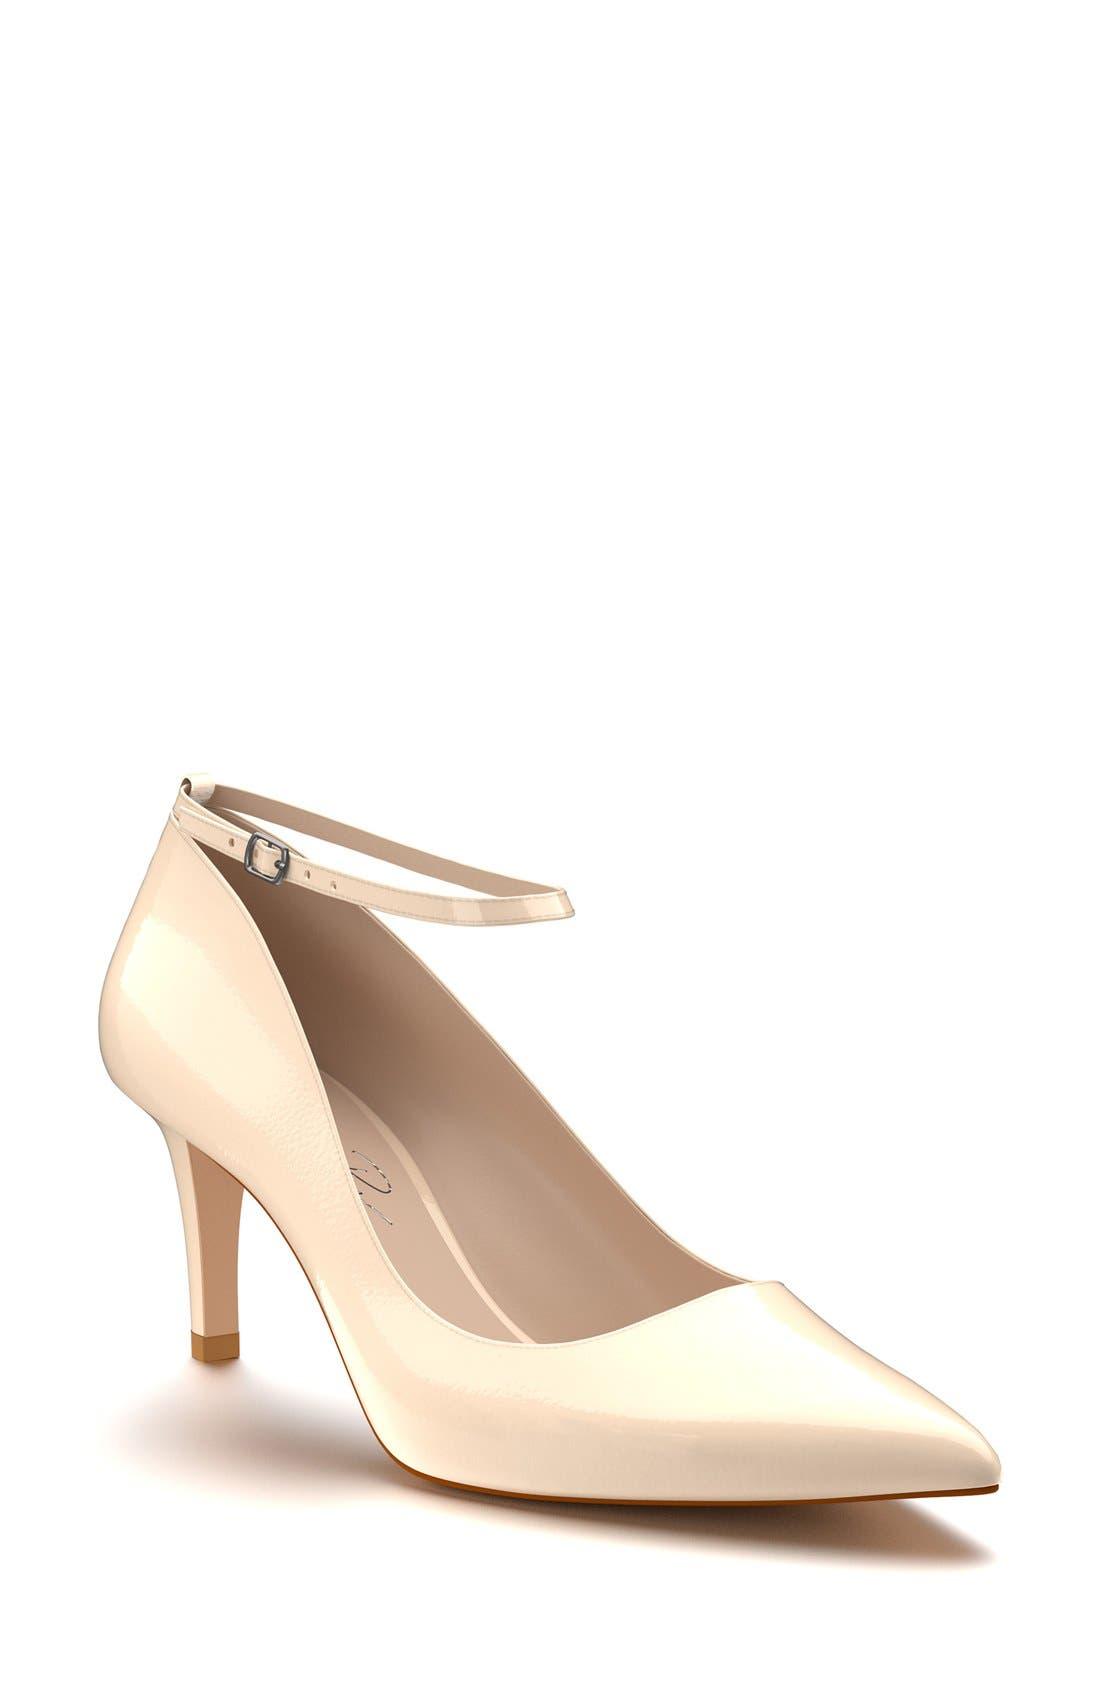 Shoes of Prey Ankle Strap Pump (Women)